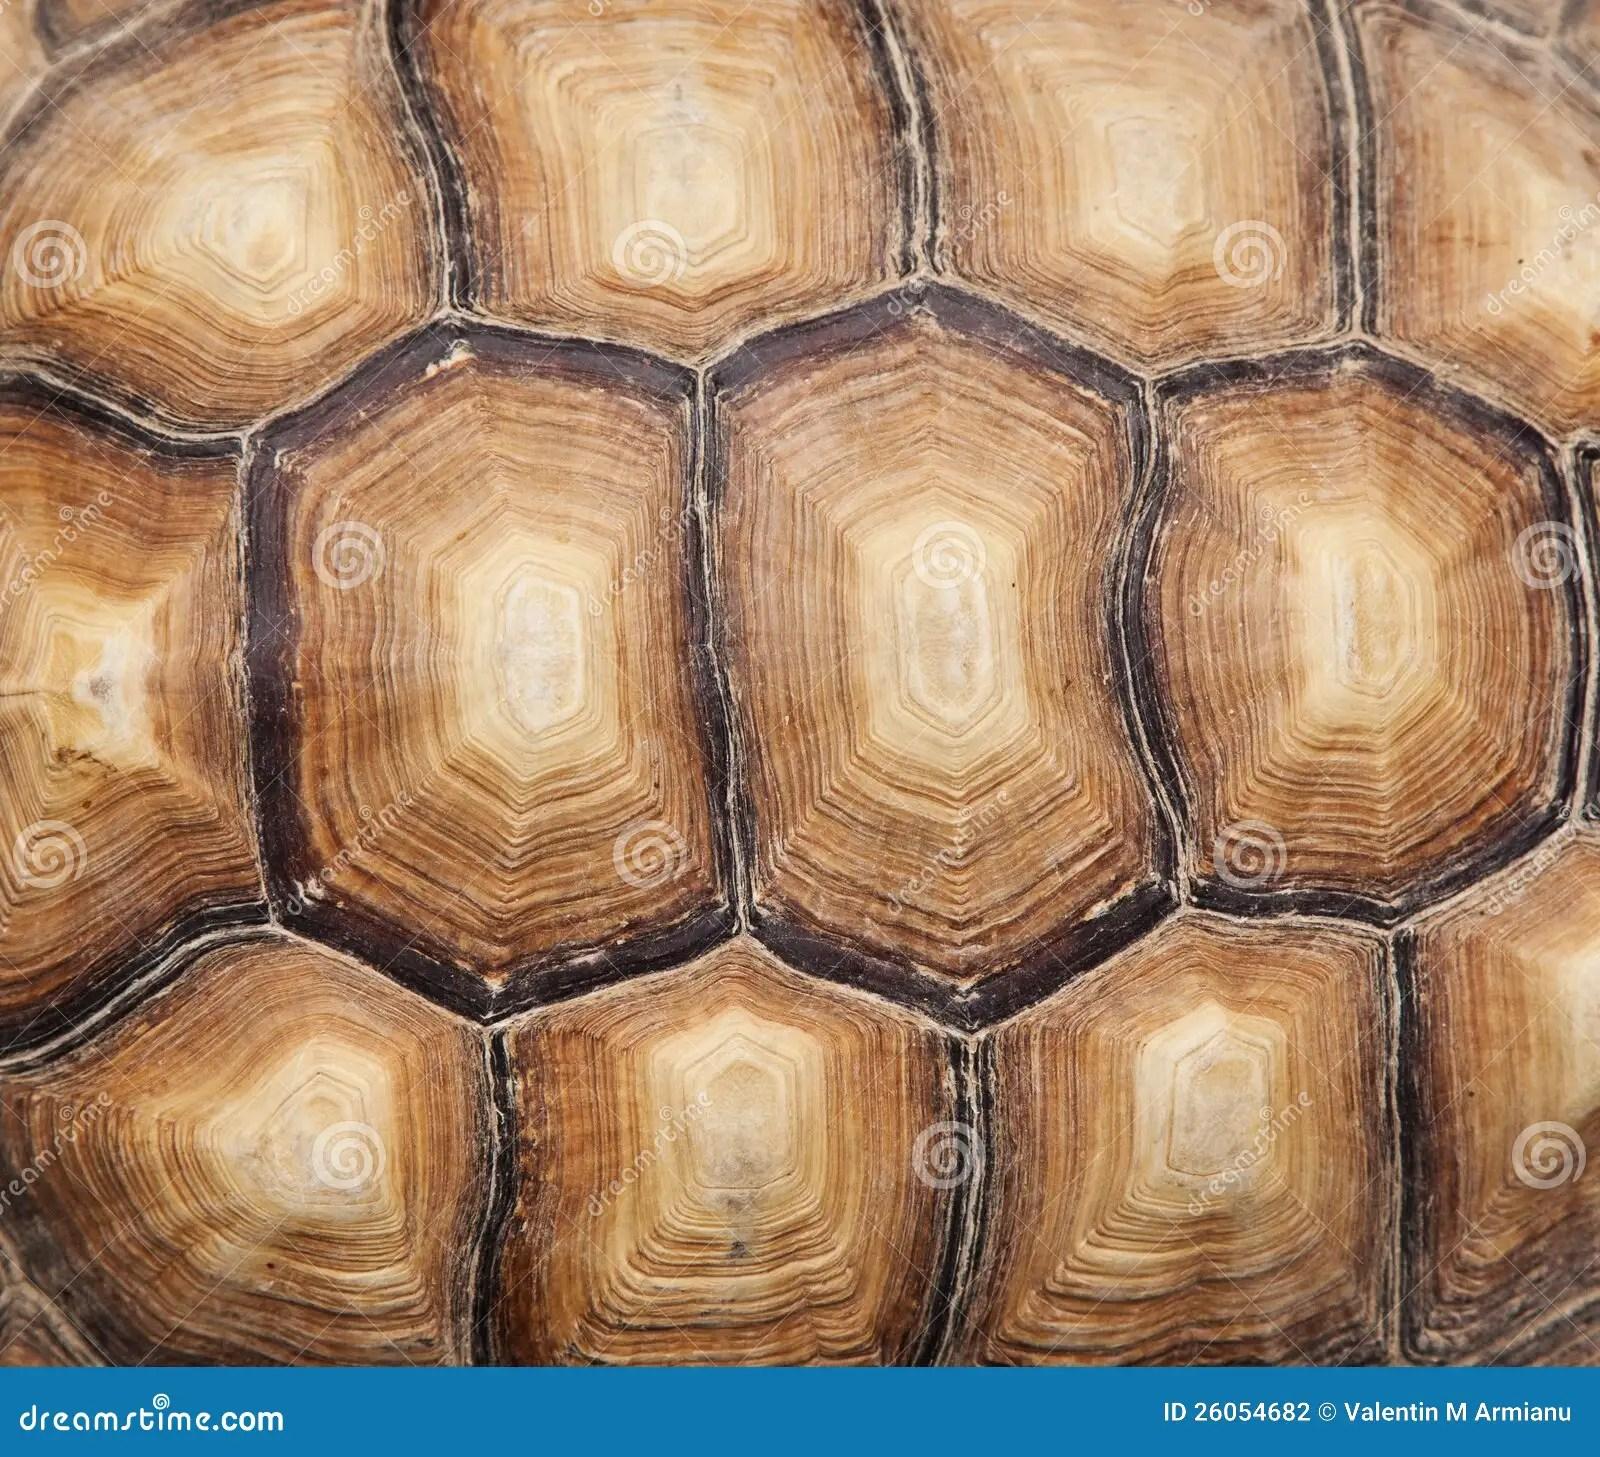 Cute Ninja Turtle Wallpaper Tortoise Shell Stock Photo Image Of Texture Closeup